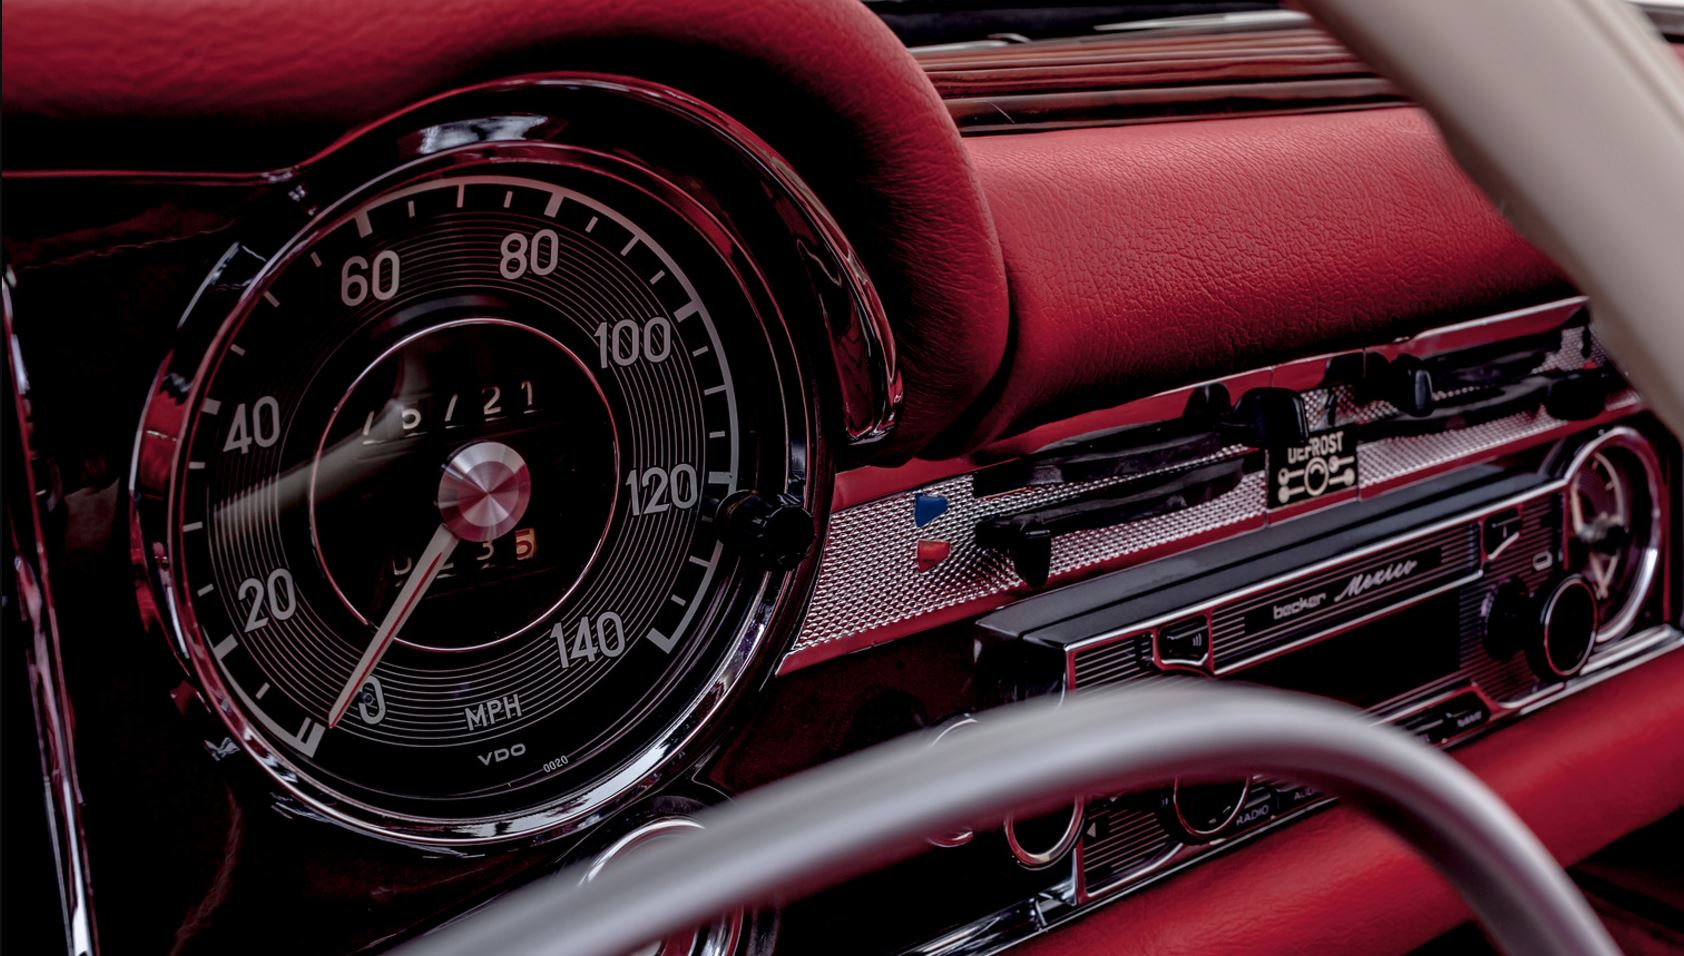 Hemmels - classic interior trimming